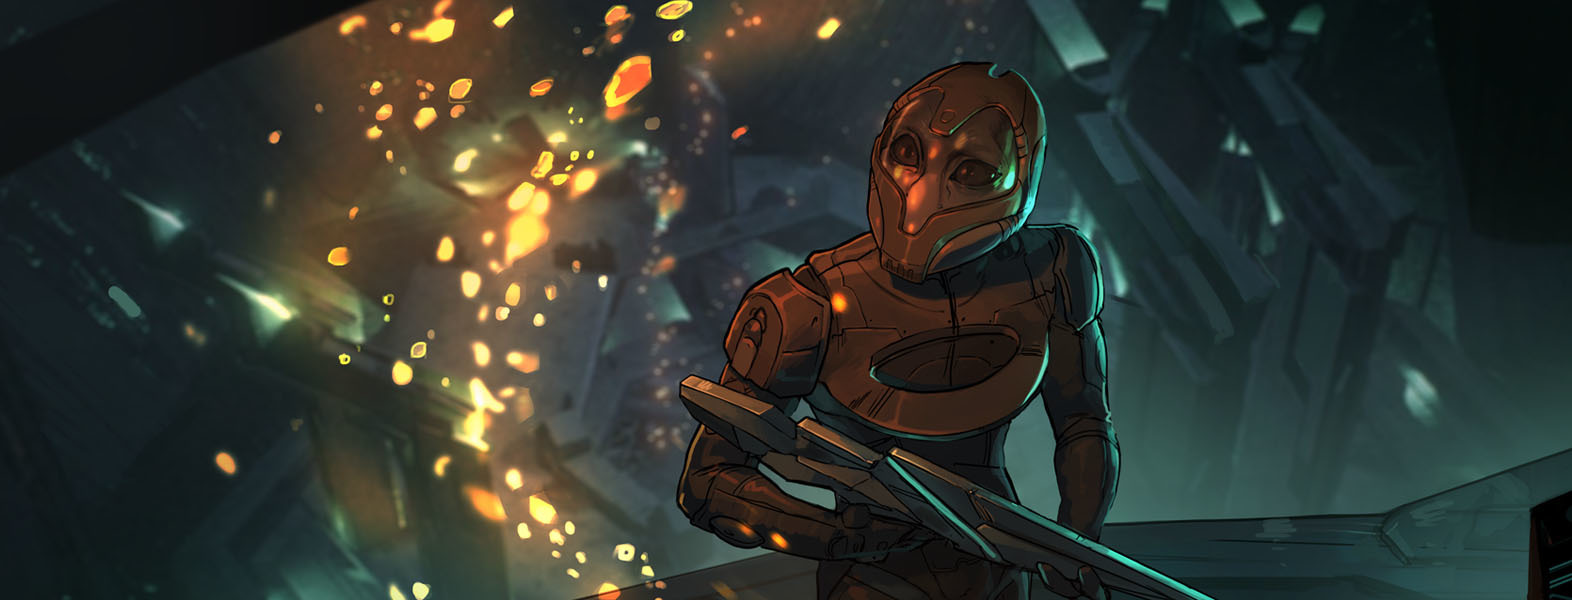 APEX Mission: Archon's Remnant Fortress